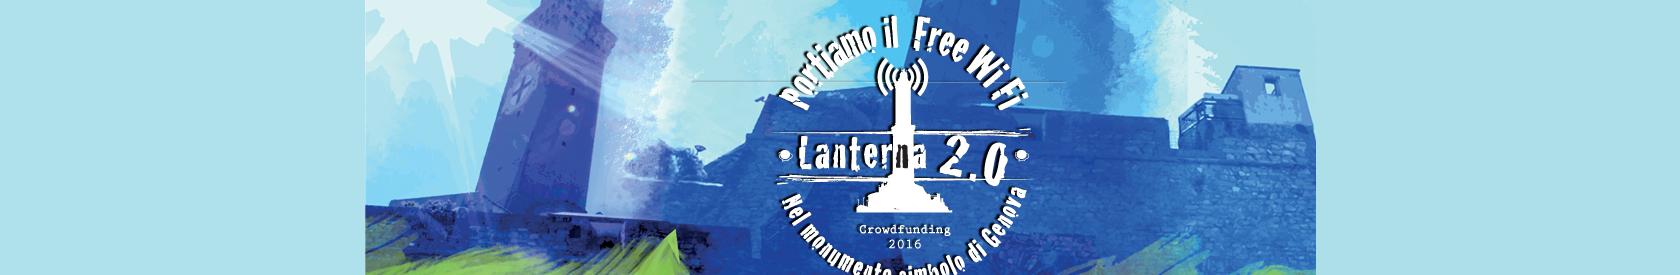 Lanterna di Genova 2.0